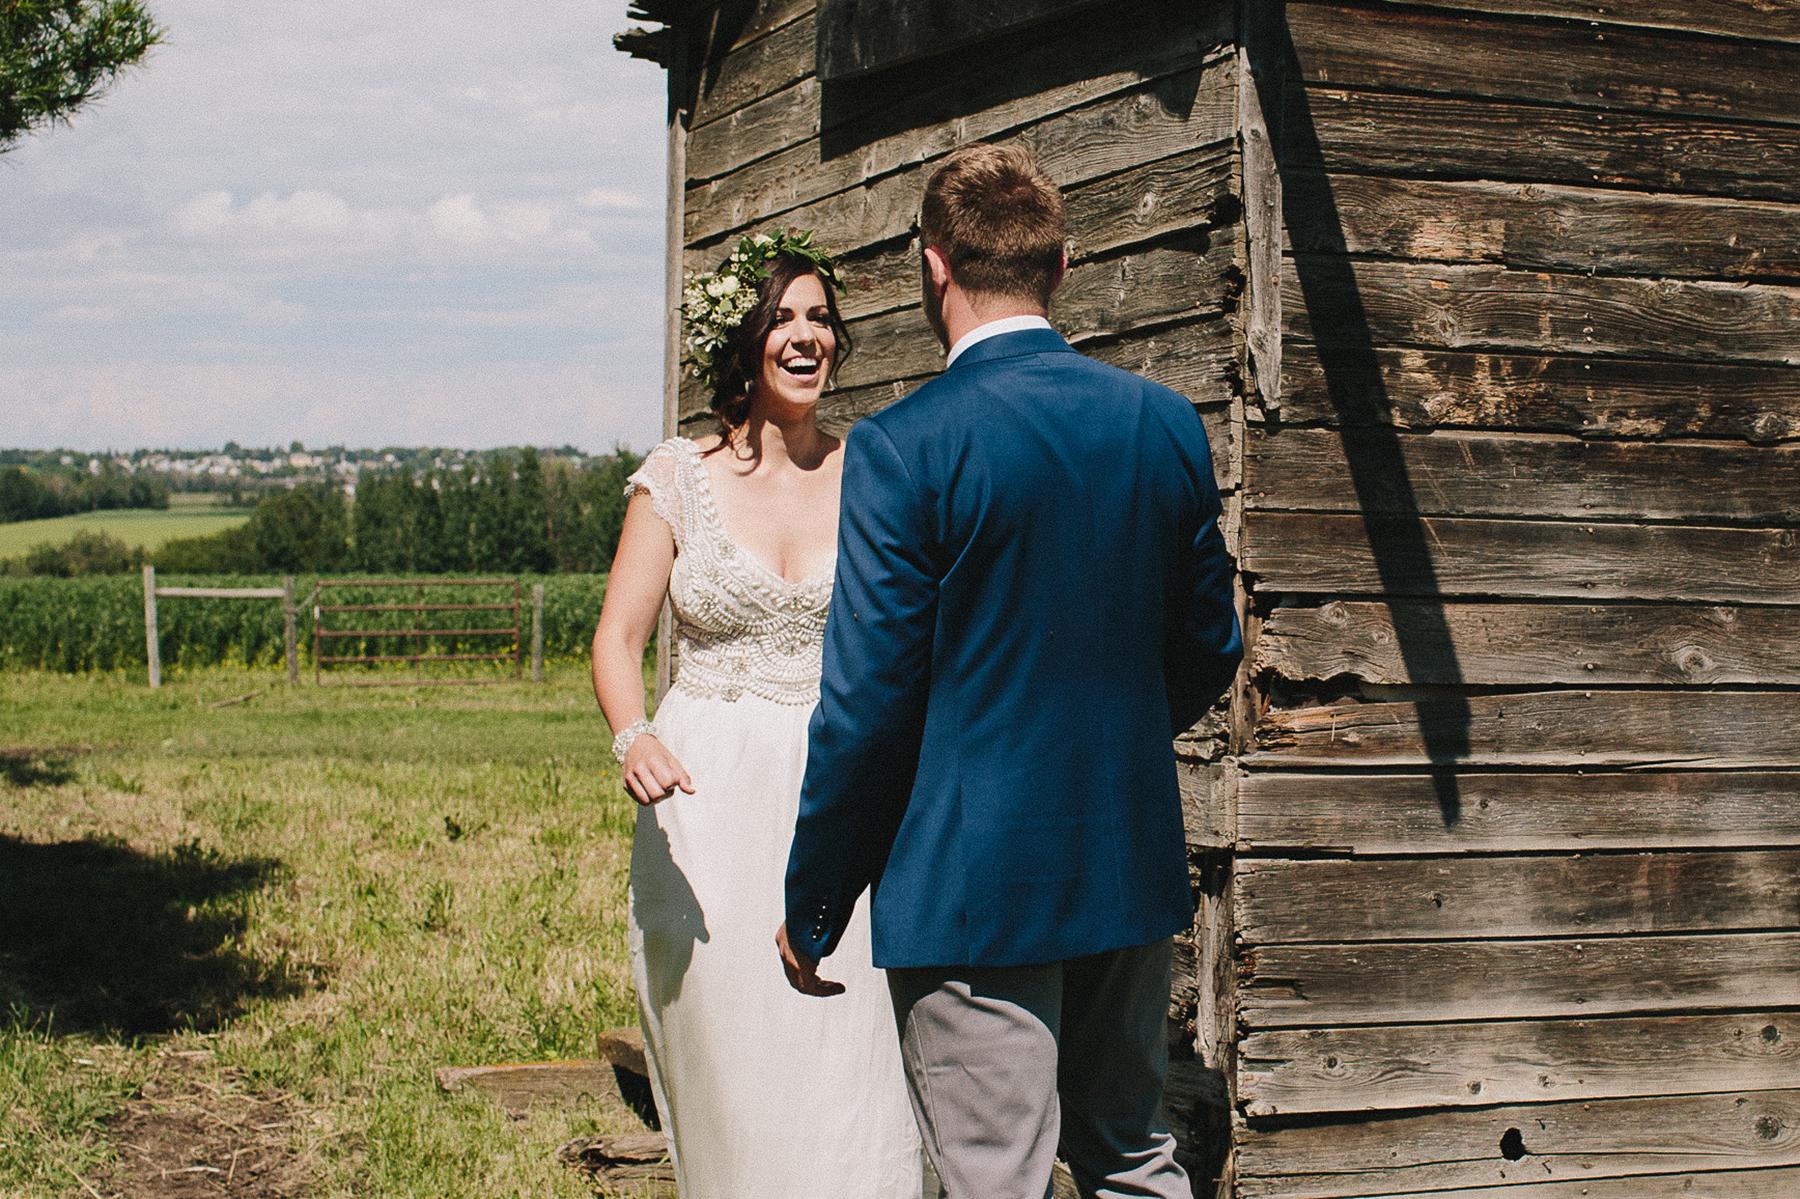 alberta-farm-wedding-photographer-rp-wj-047.jpg